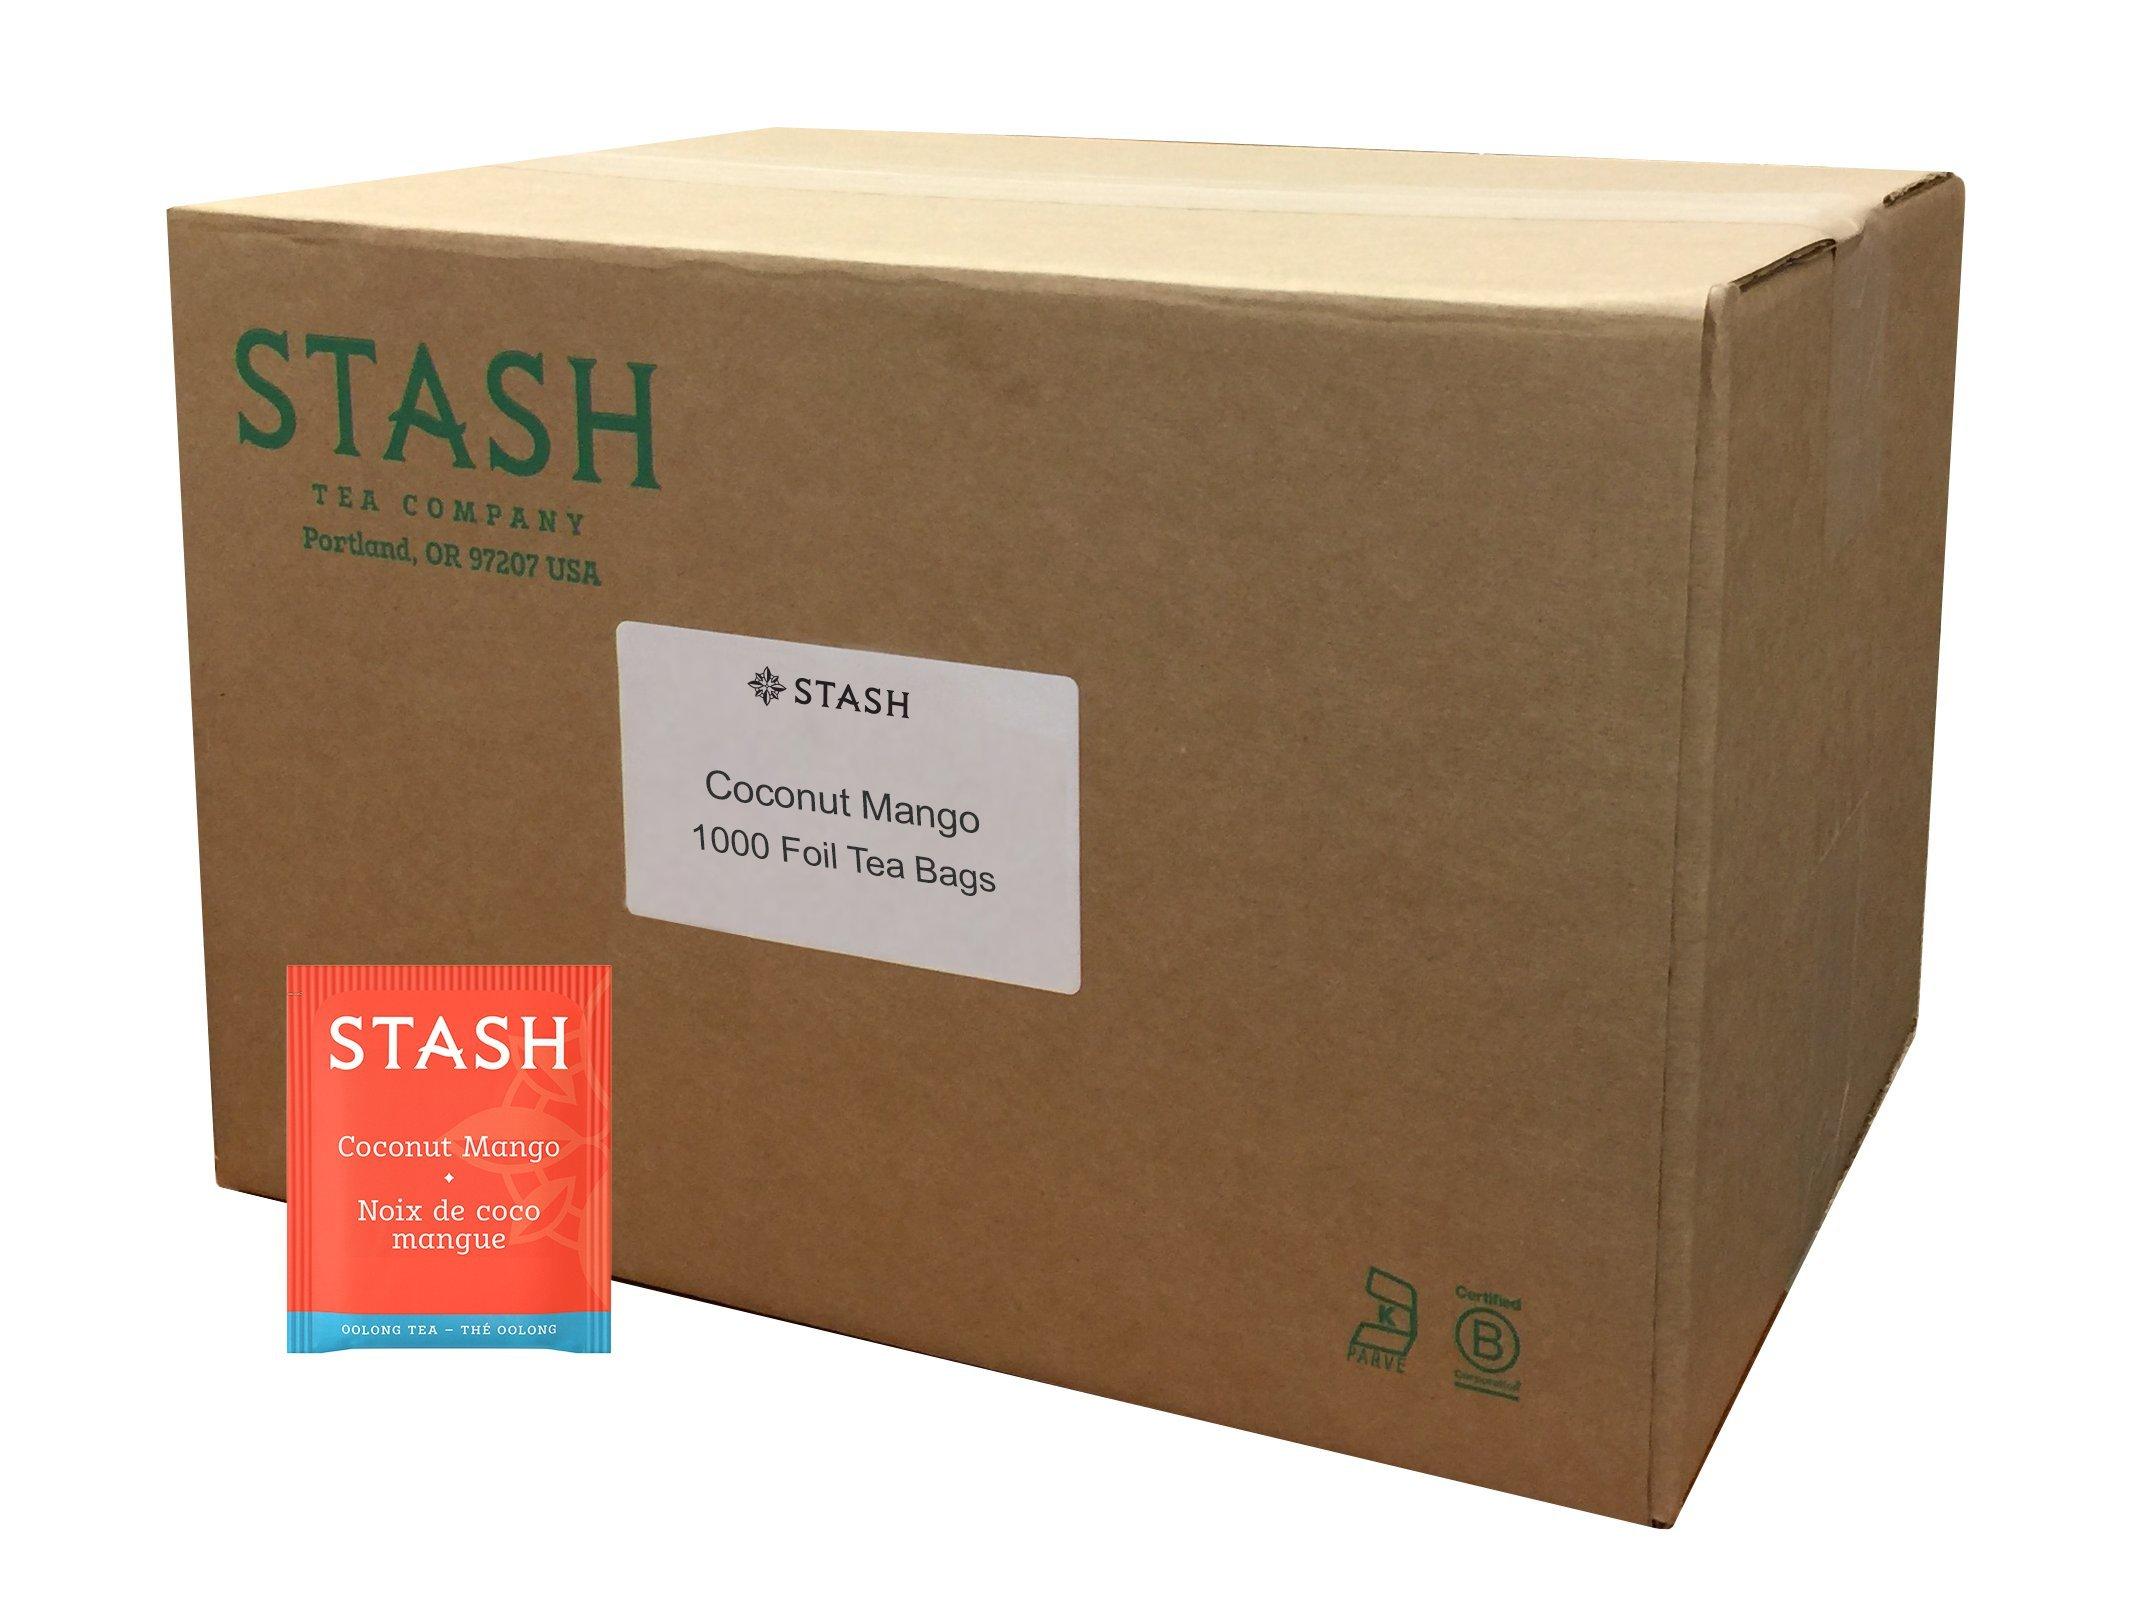 Stash Tea Coconut Mango Wuyi Oolong Tea 1000 Count Tea Bags in Foil, Individual Black Tea Bags for Use in Teapots Mugs or Cups, Brew Hot Tea or Iced Tea, Fair Trade Certified